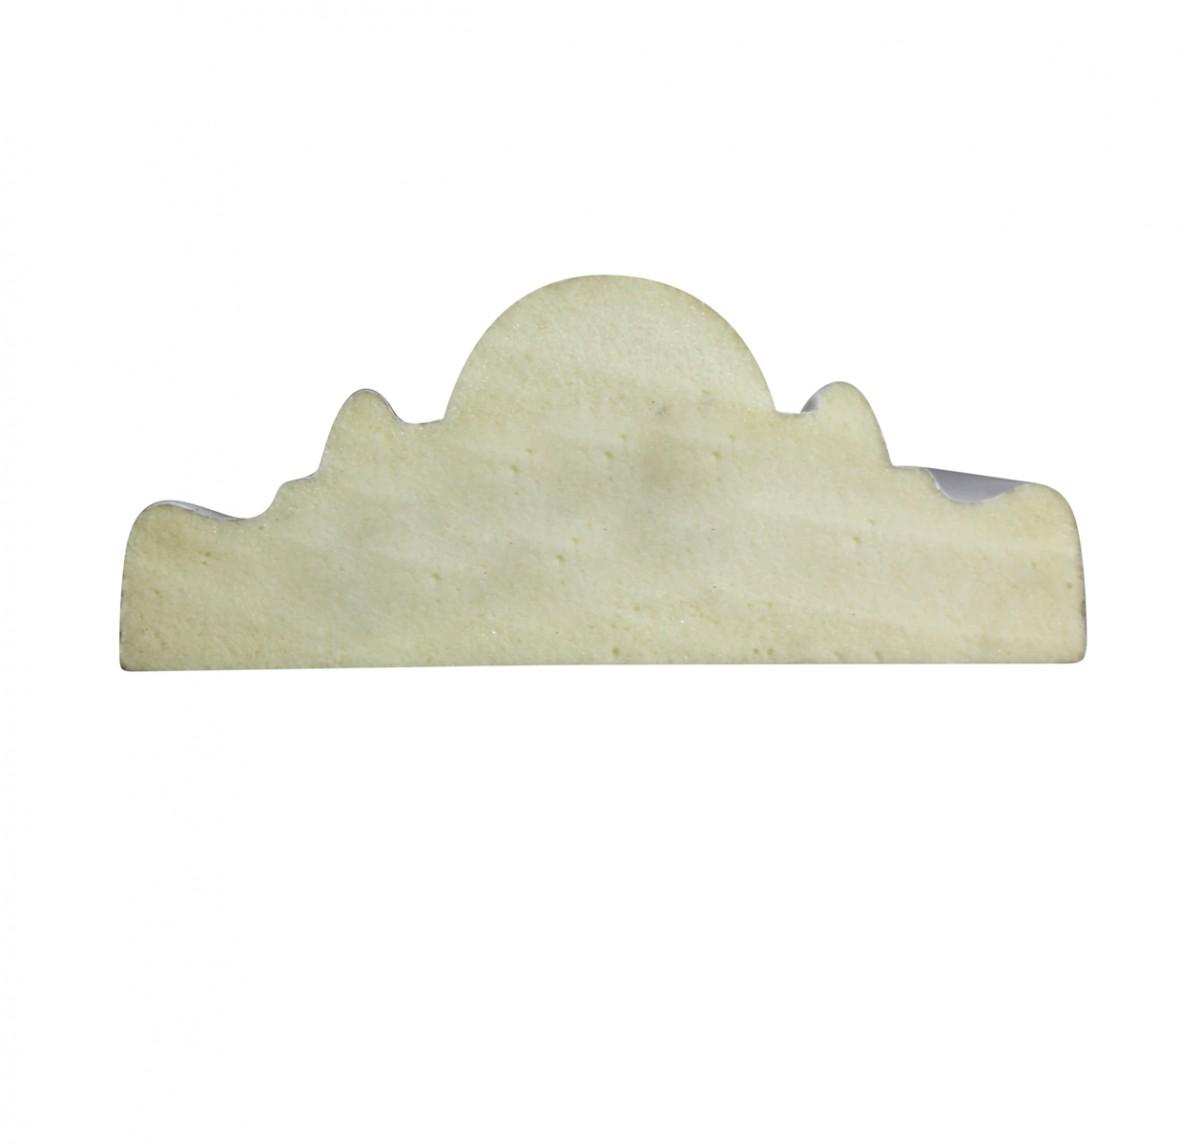 Cornice White Urethane Sample of 20418 19.75 Long Cornice Cornice Moulding Cornice Molding